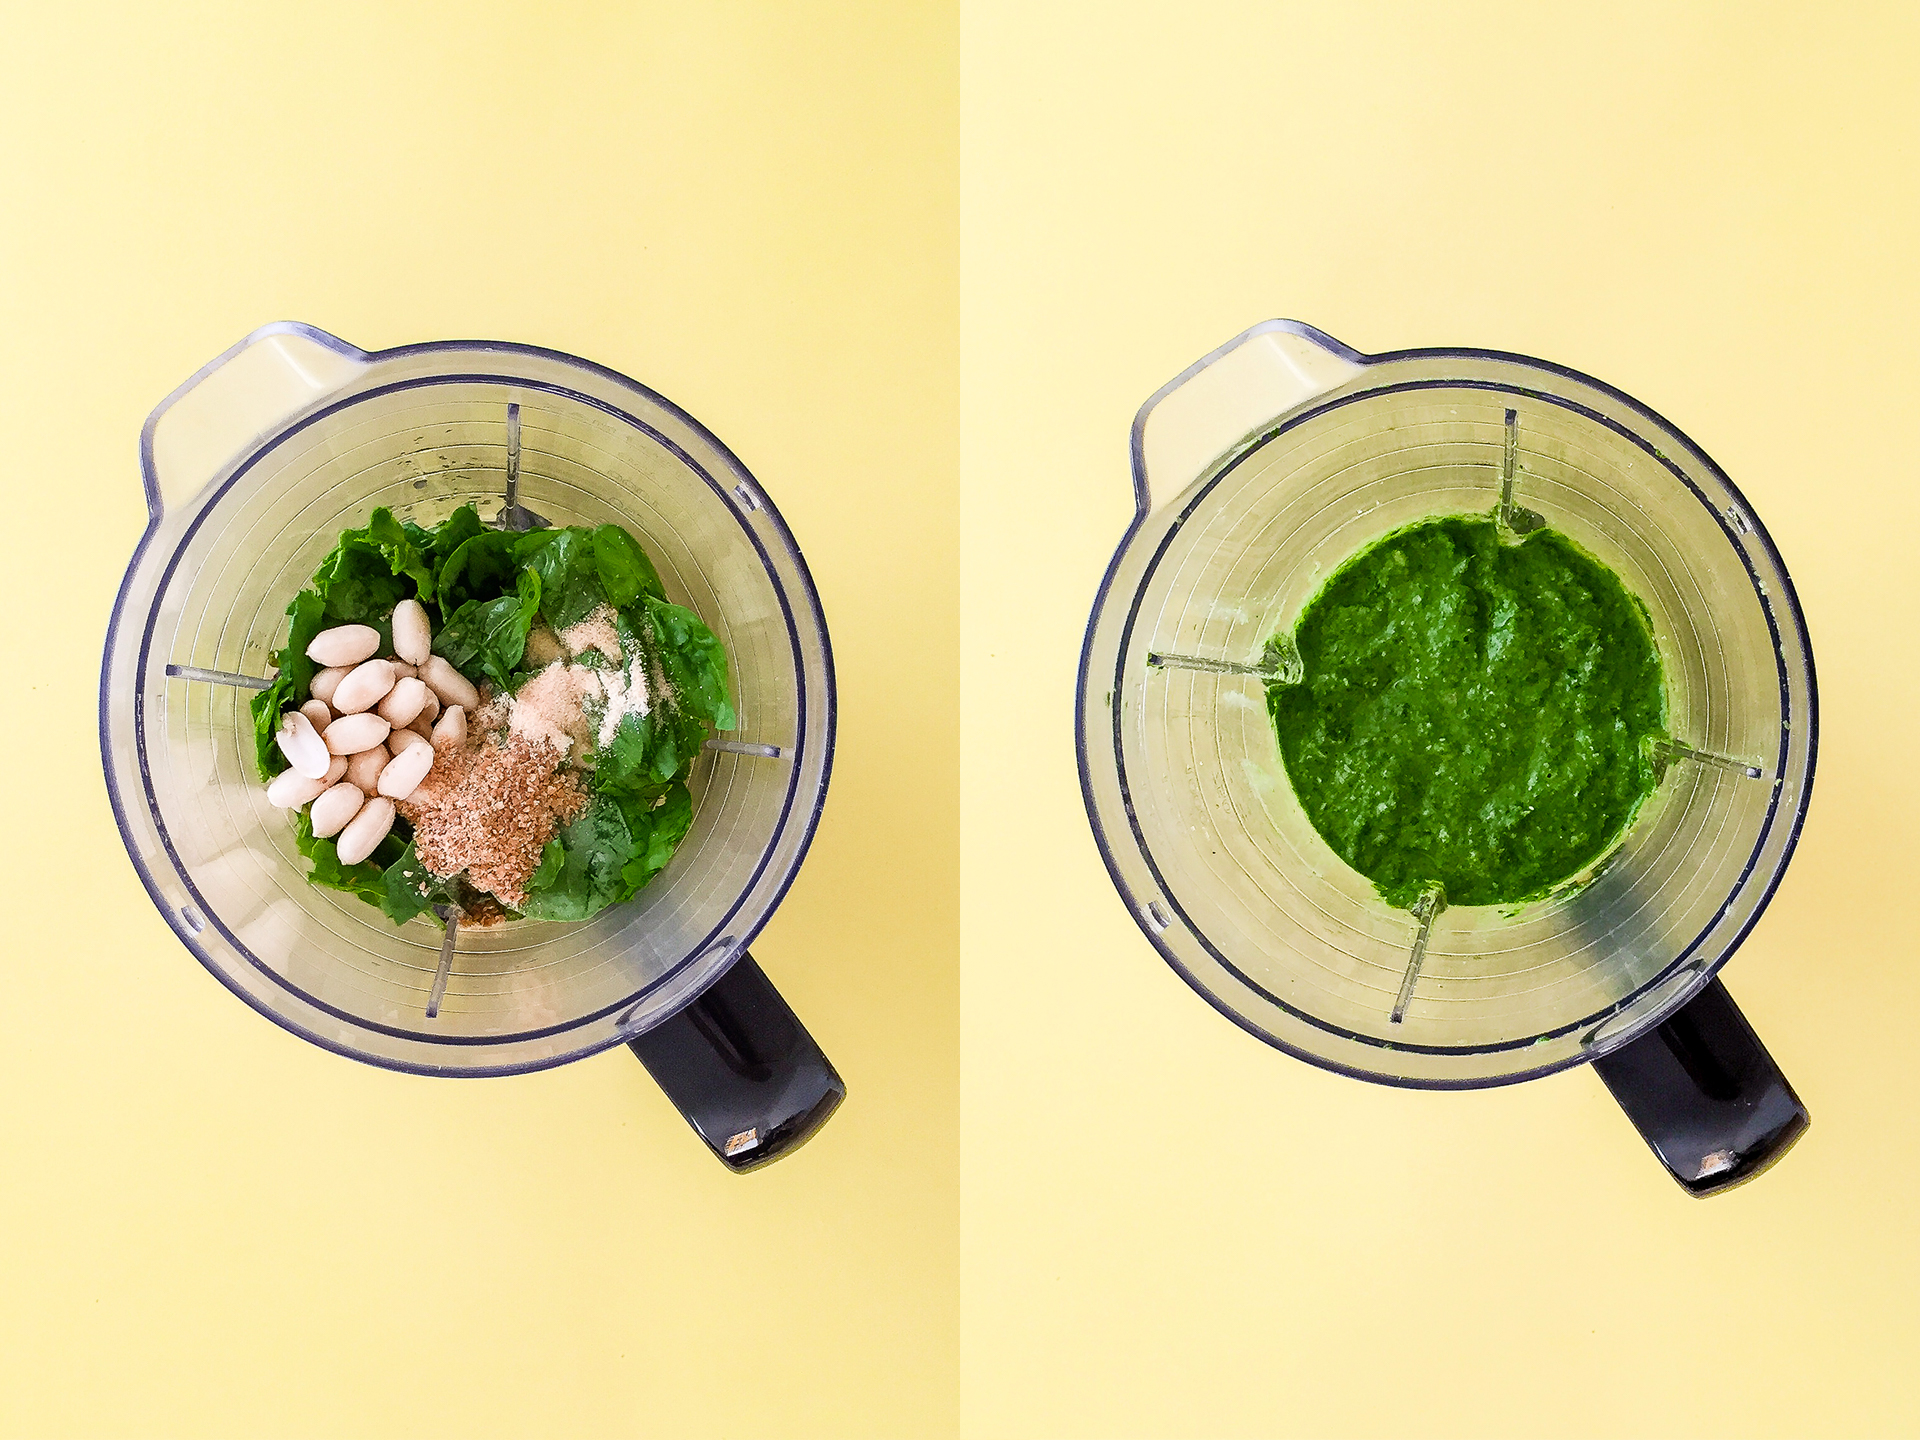 Step 2.1 of Spinach Mushroom Pesto Pasta Recipe